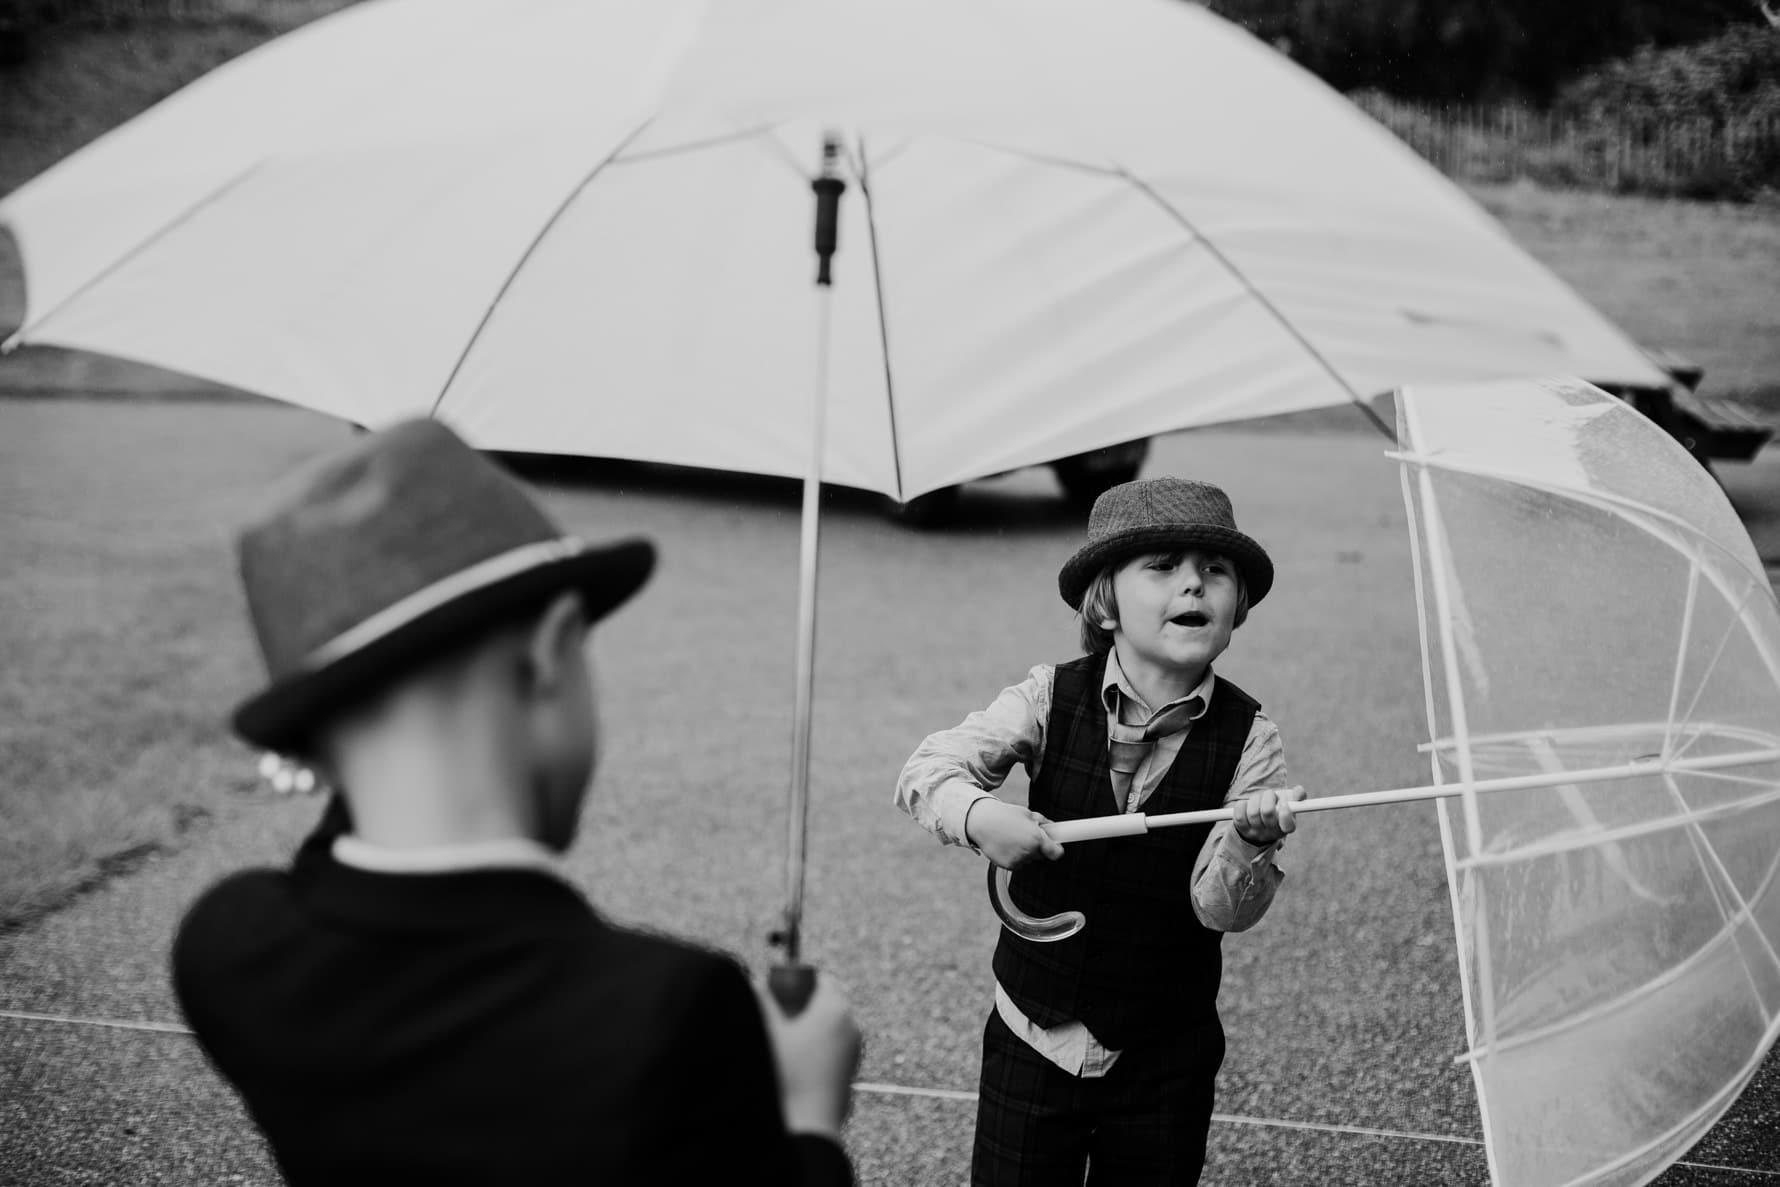 paige boy holding an umbrella